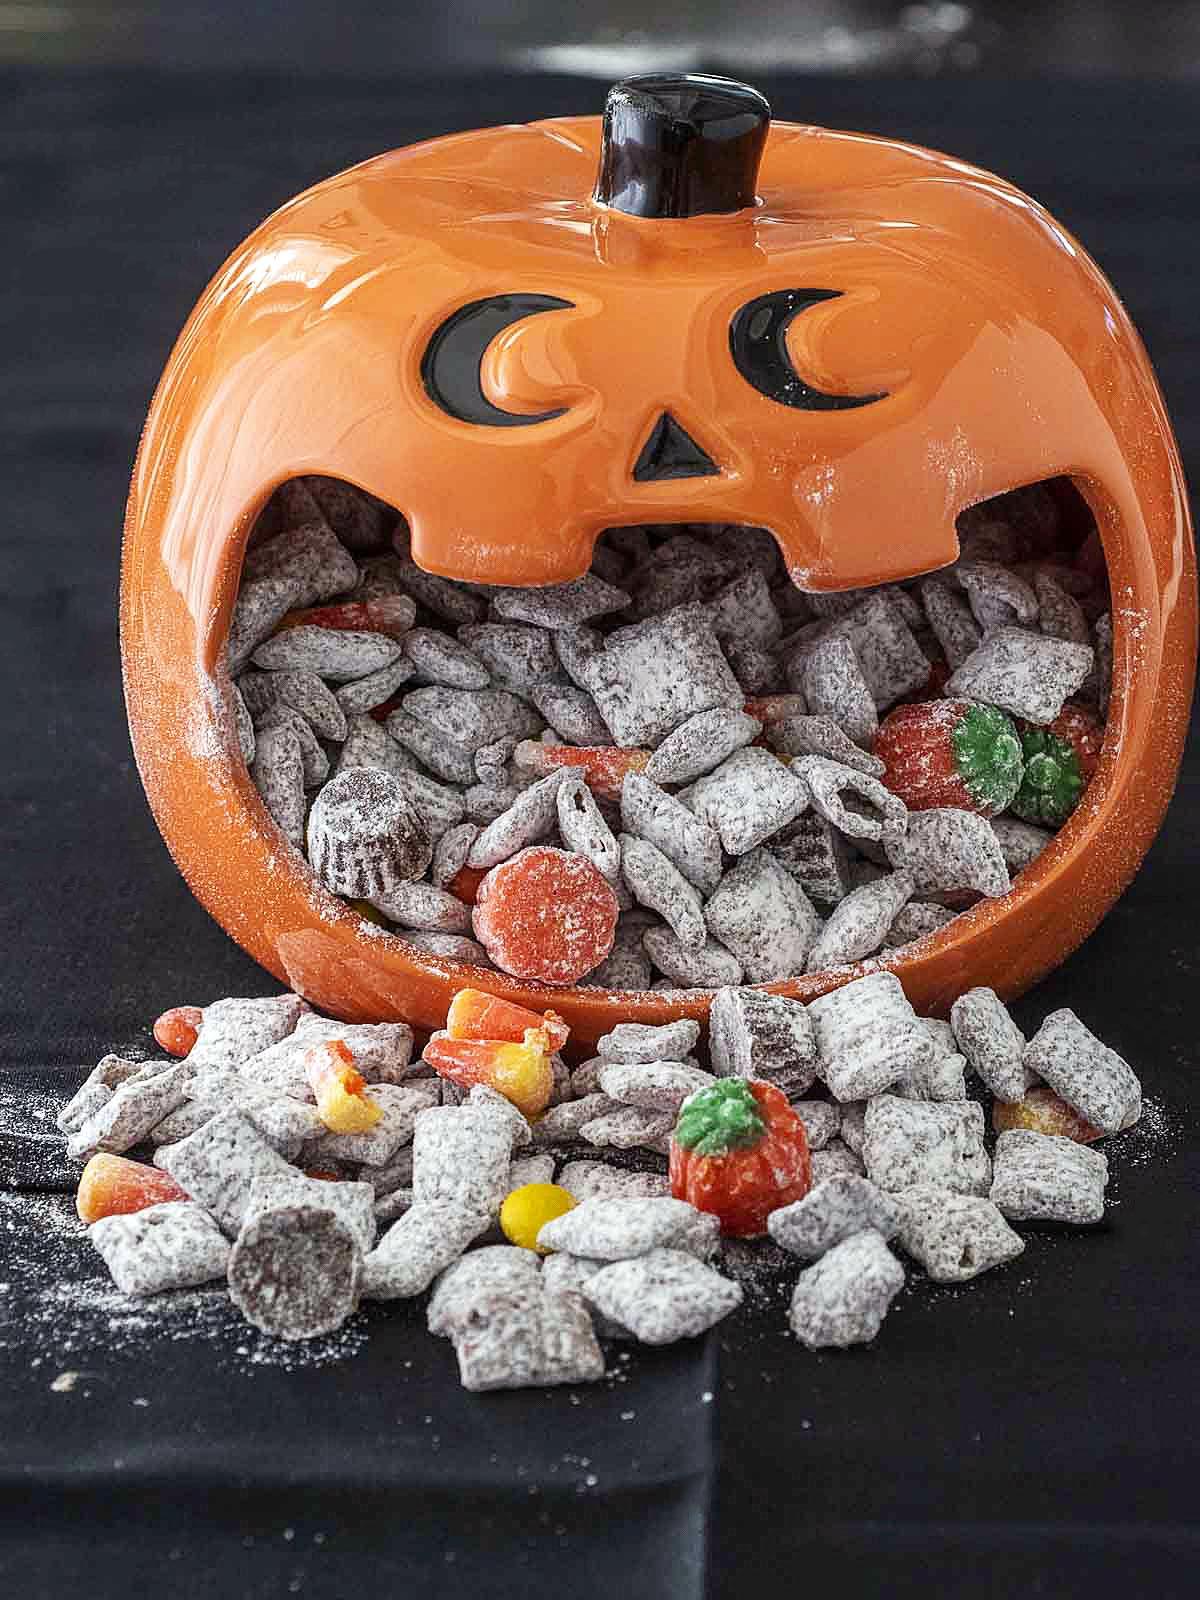 A jack-o-lantern candy dish full of Halloween Muddy Buddies.